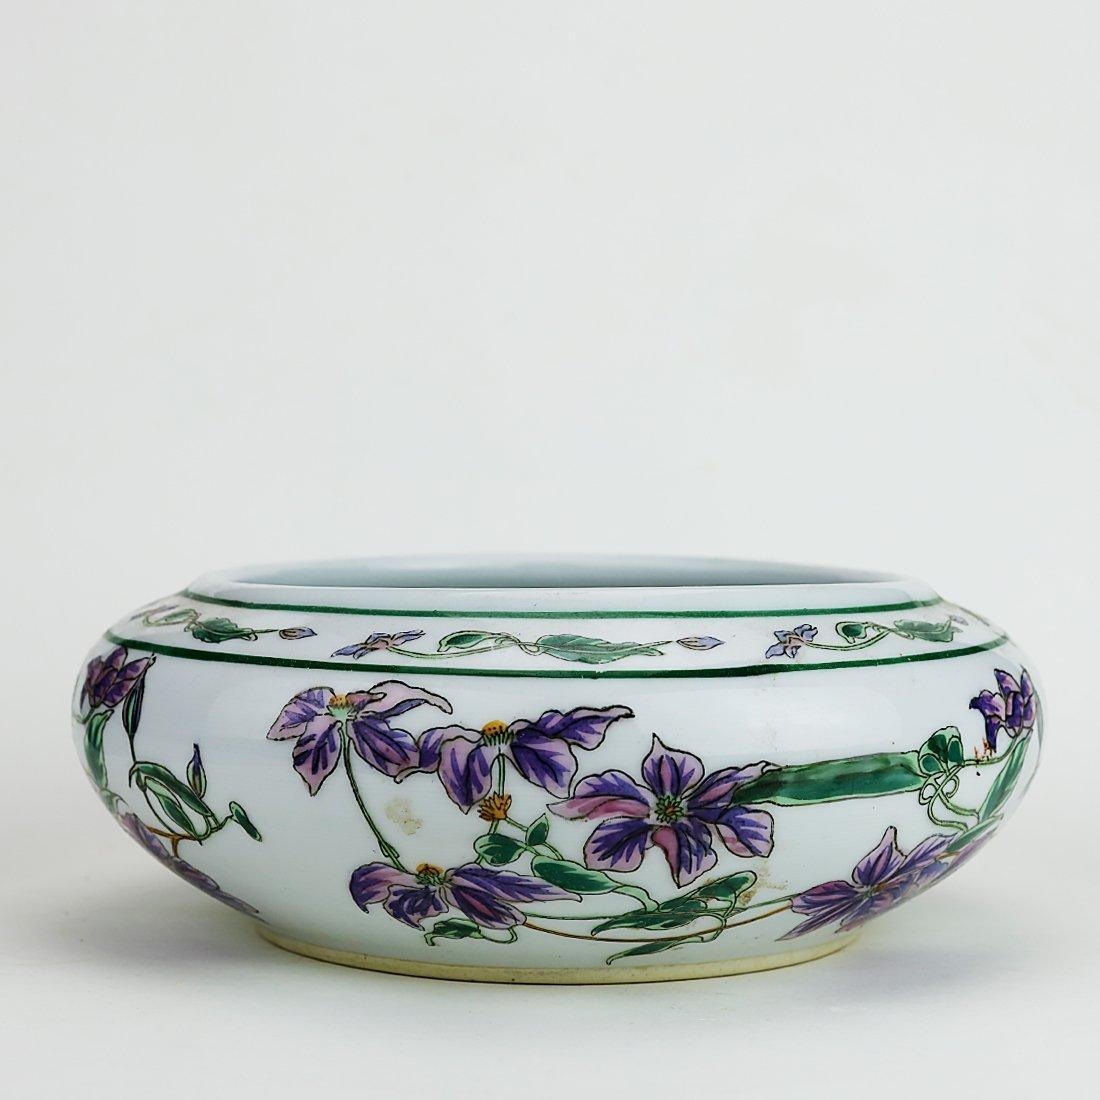 Chinese porcelain writing-brush wash, Jingdezhen